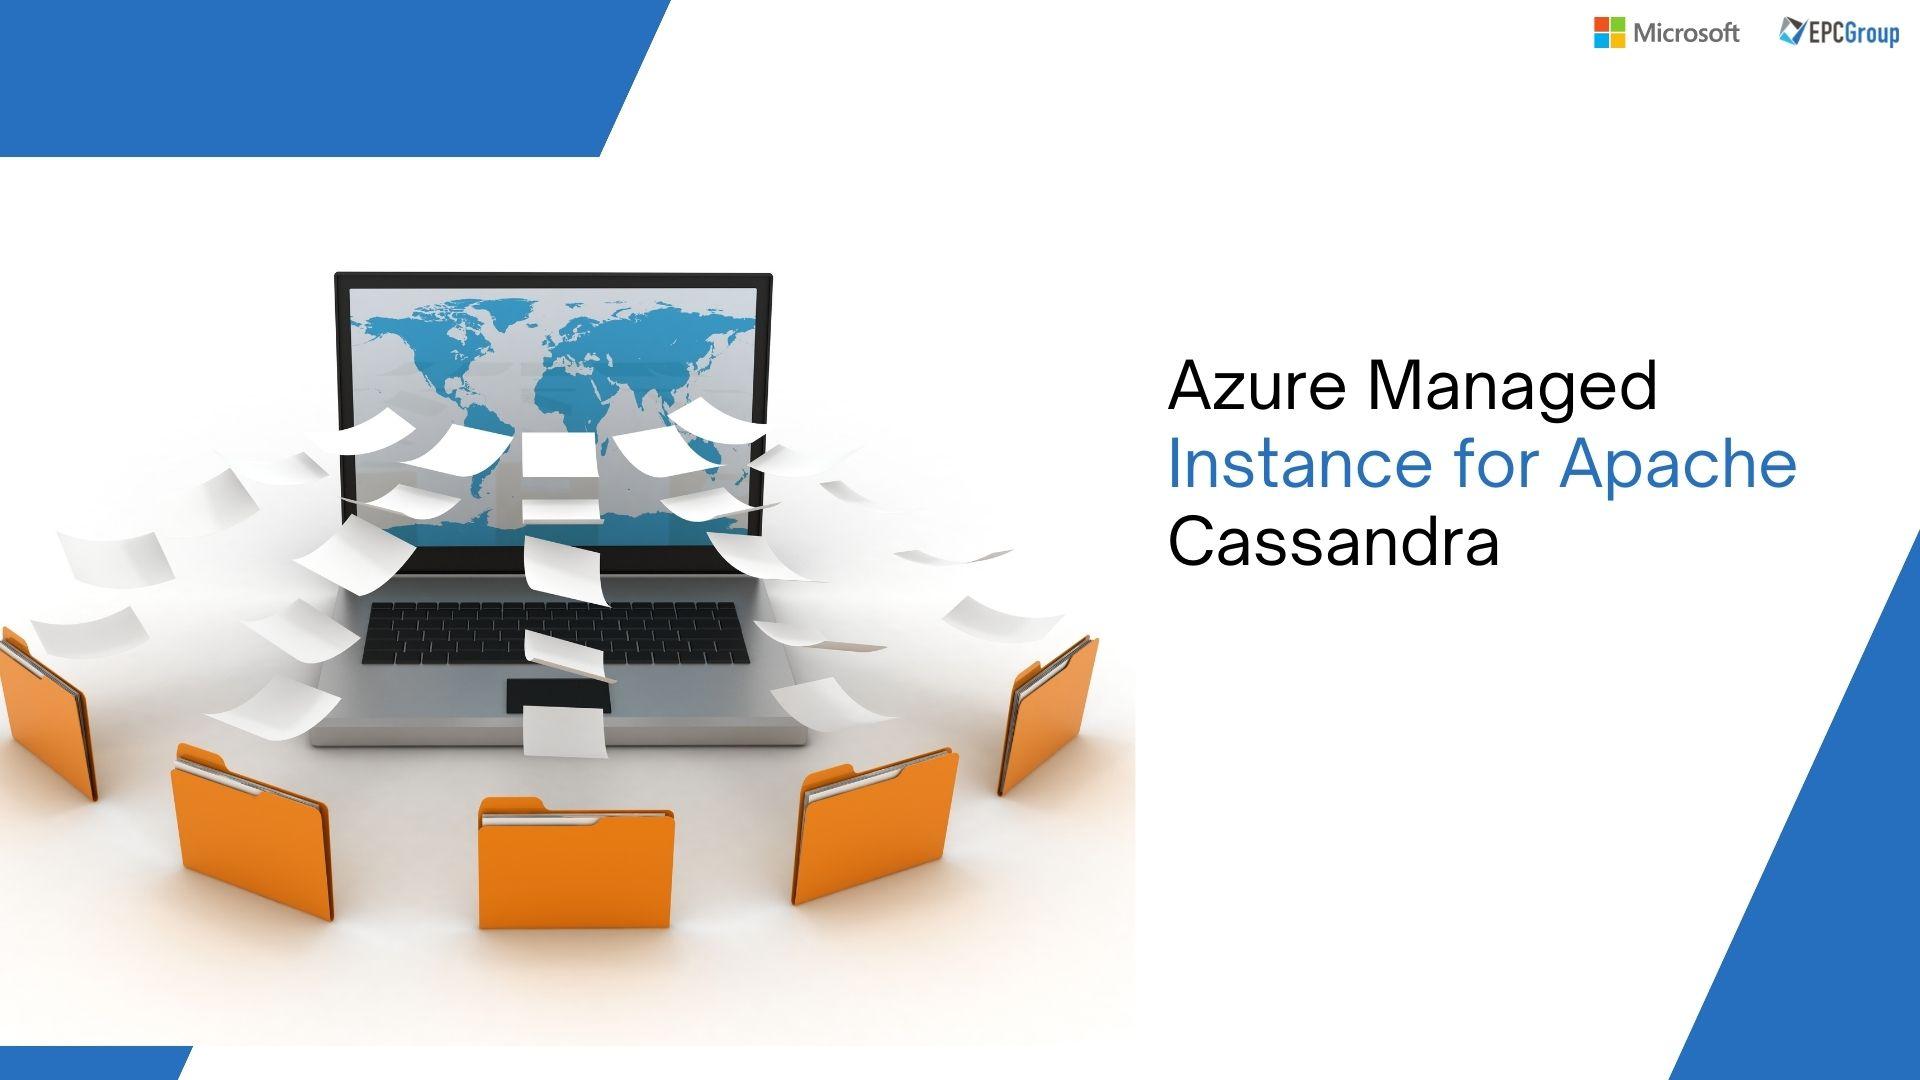 Azure Managed Instance for Apache Cassandra: Apache Cassandra Datacenters - thumb image